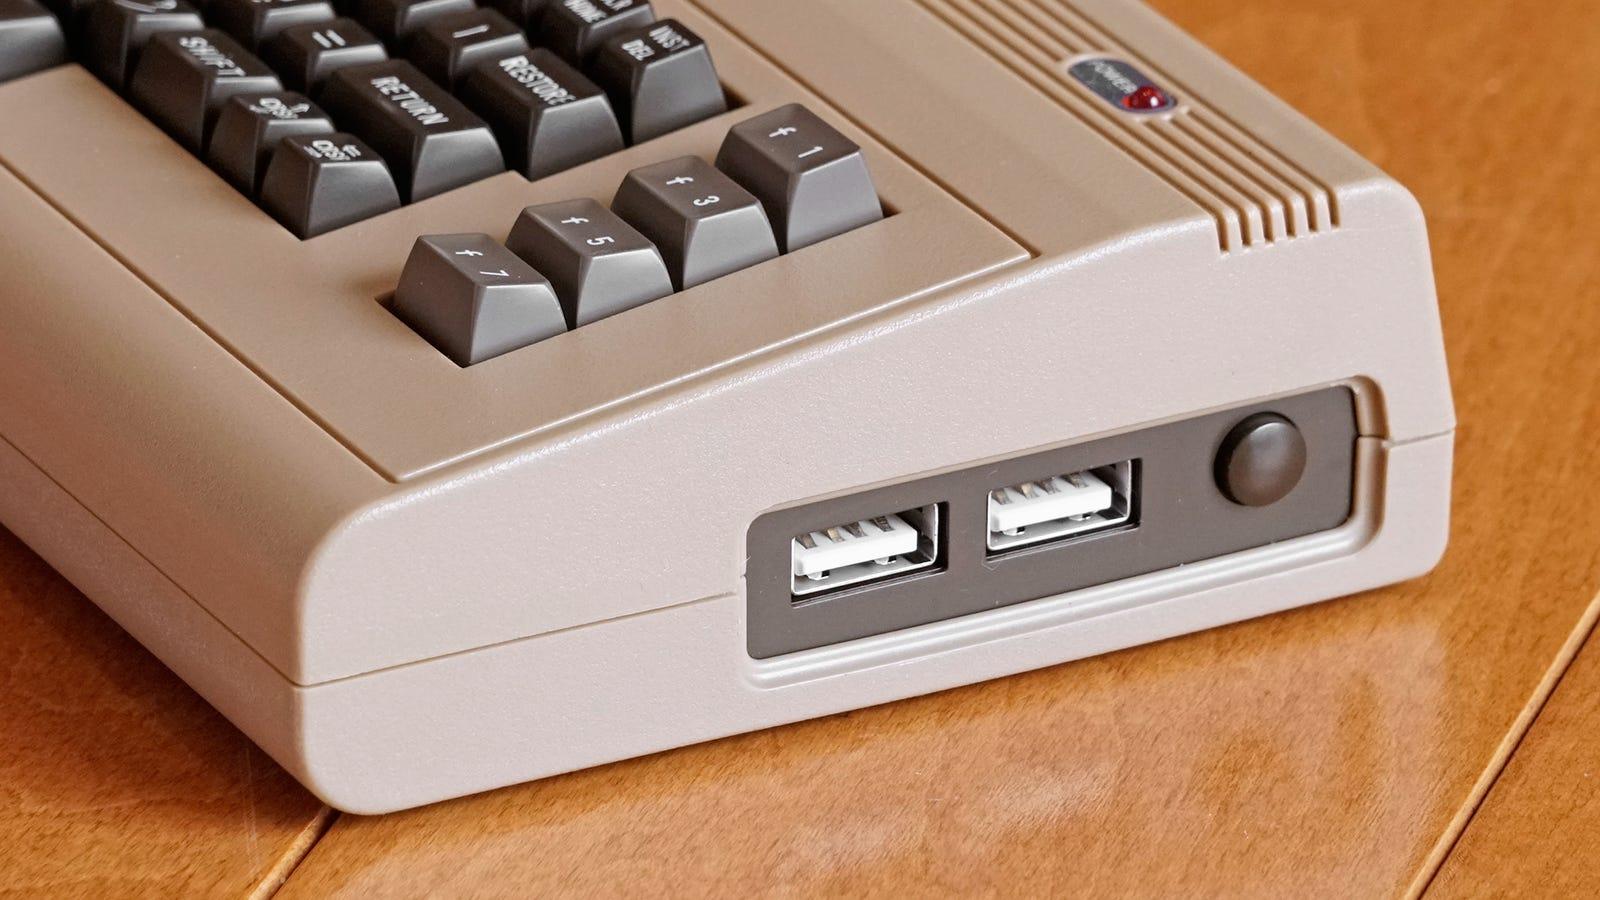 Yep, those are modern USB ports.